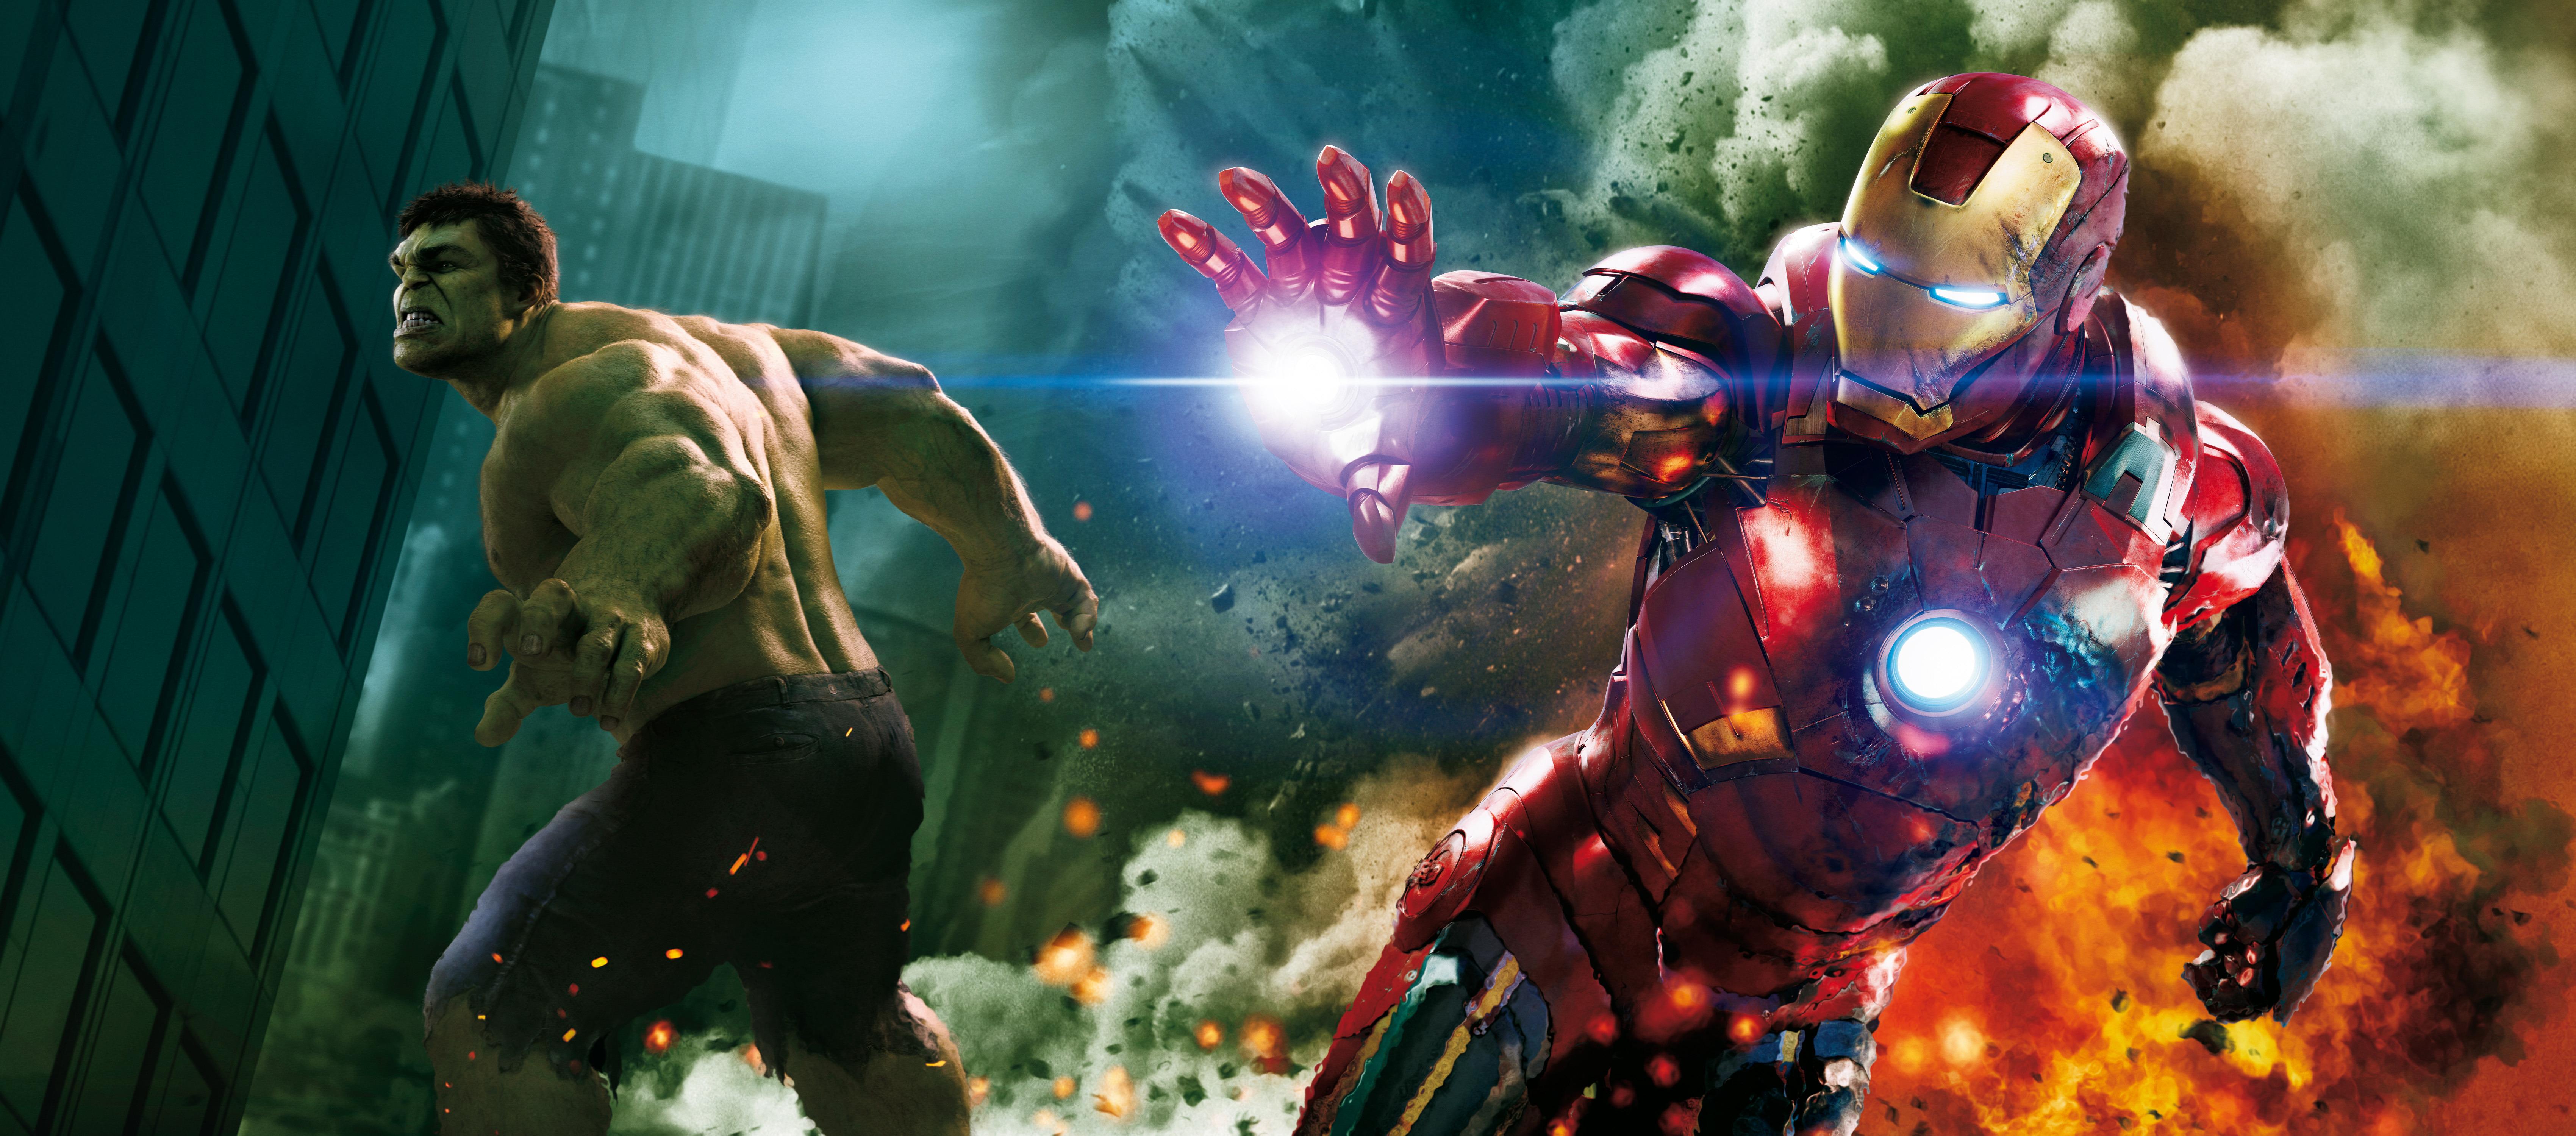 Iron Man Hulk 5k 8k Hd Superheroes 4k Wallpapers Images